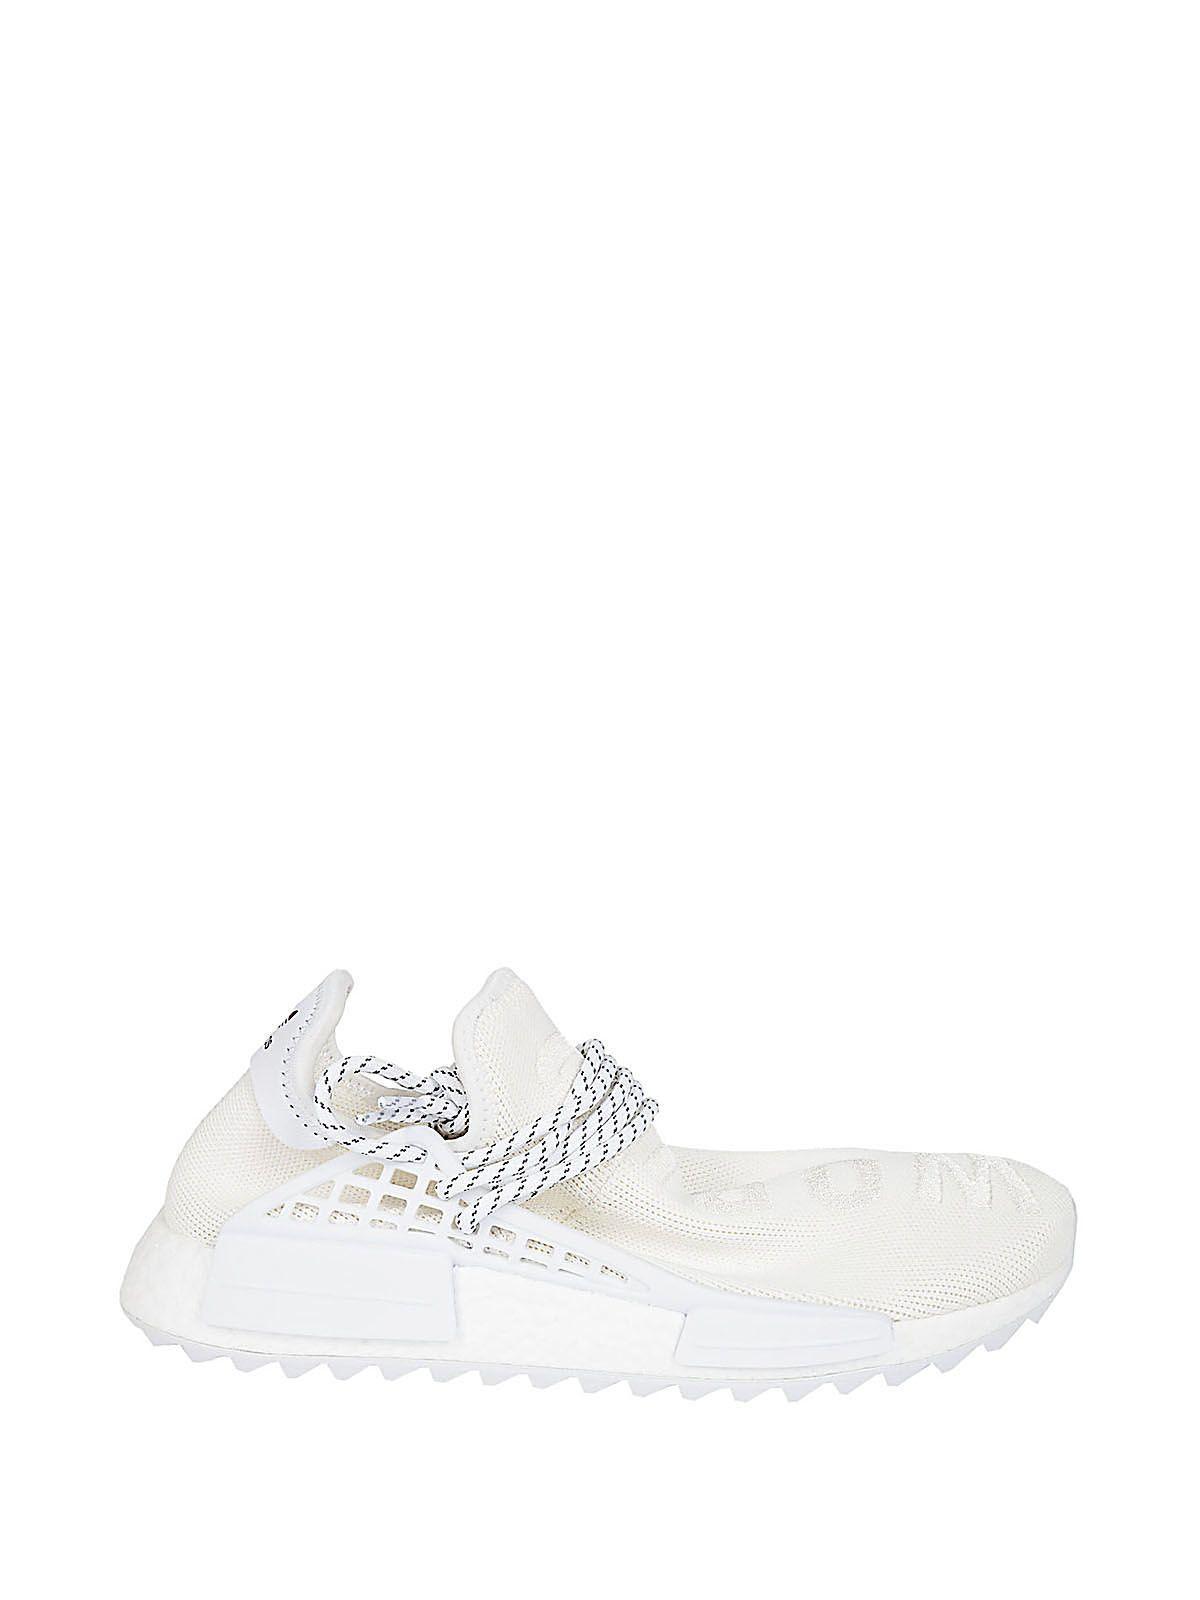 Adidas Originals By Pharrell Williams Adidas By Pharrell Williams Human Race Nmd Sneakers In White